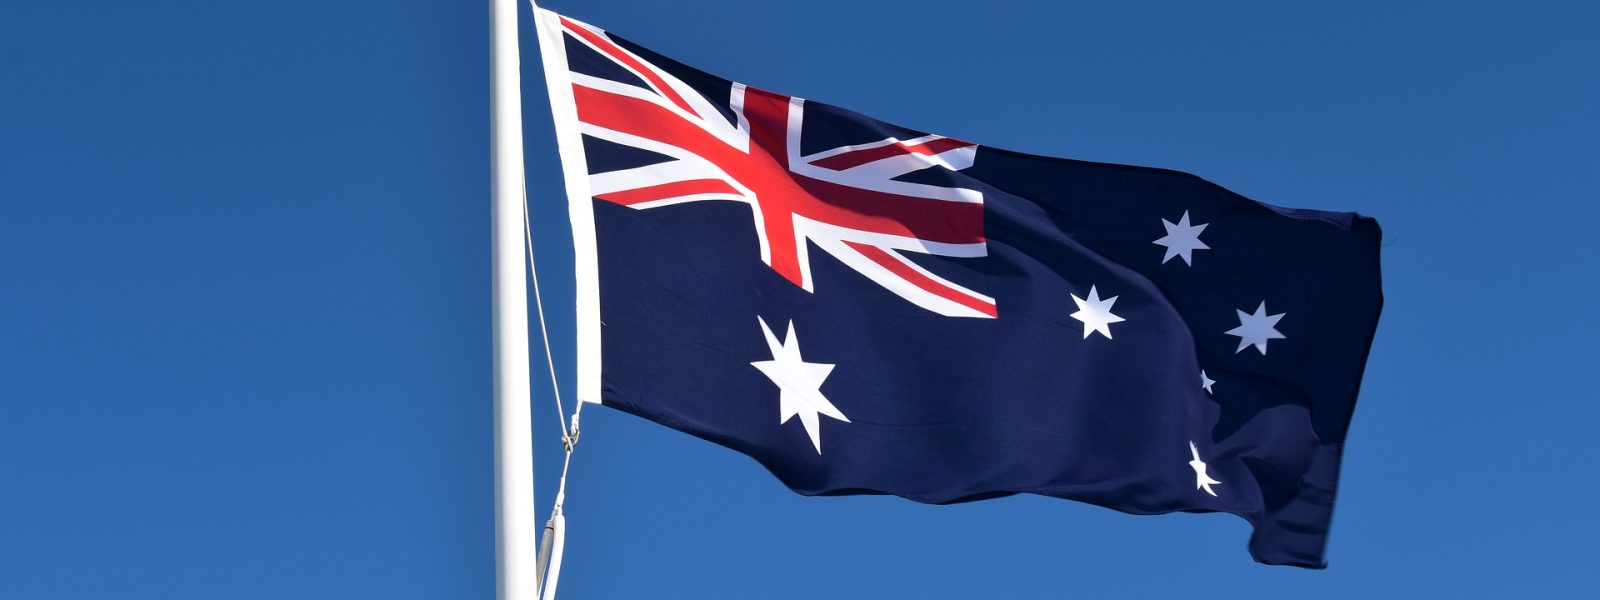 aussie revival fire Australia